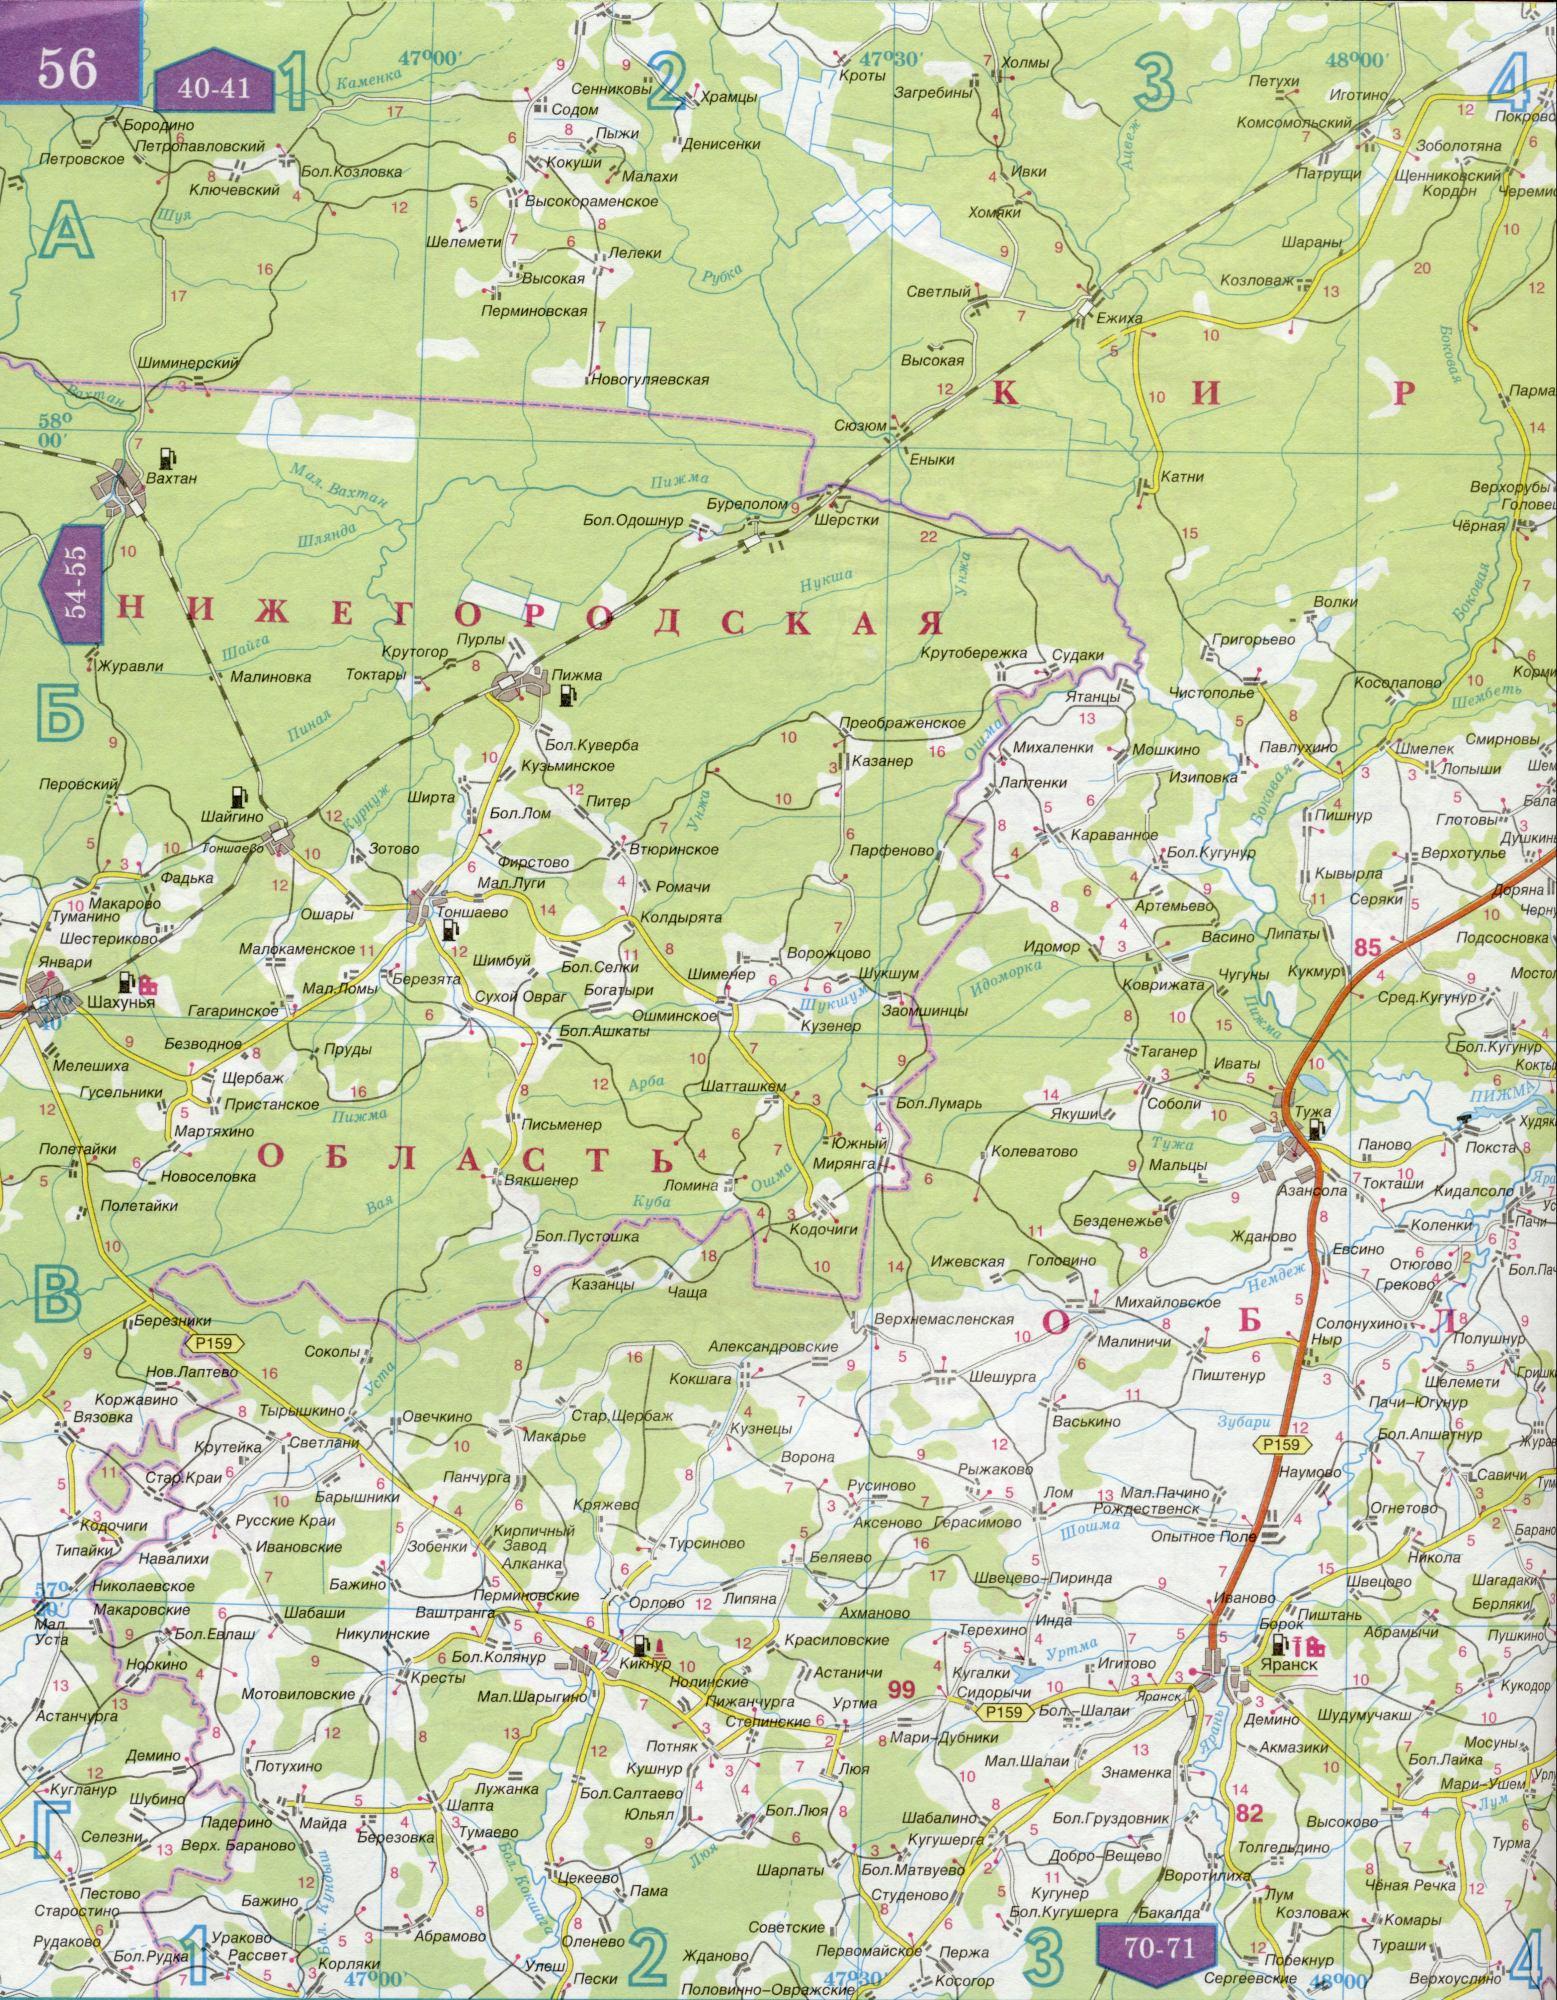 Скачать карту на майнкрафт 152 на прохождение - 06d1